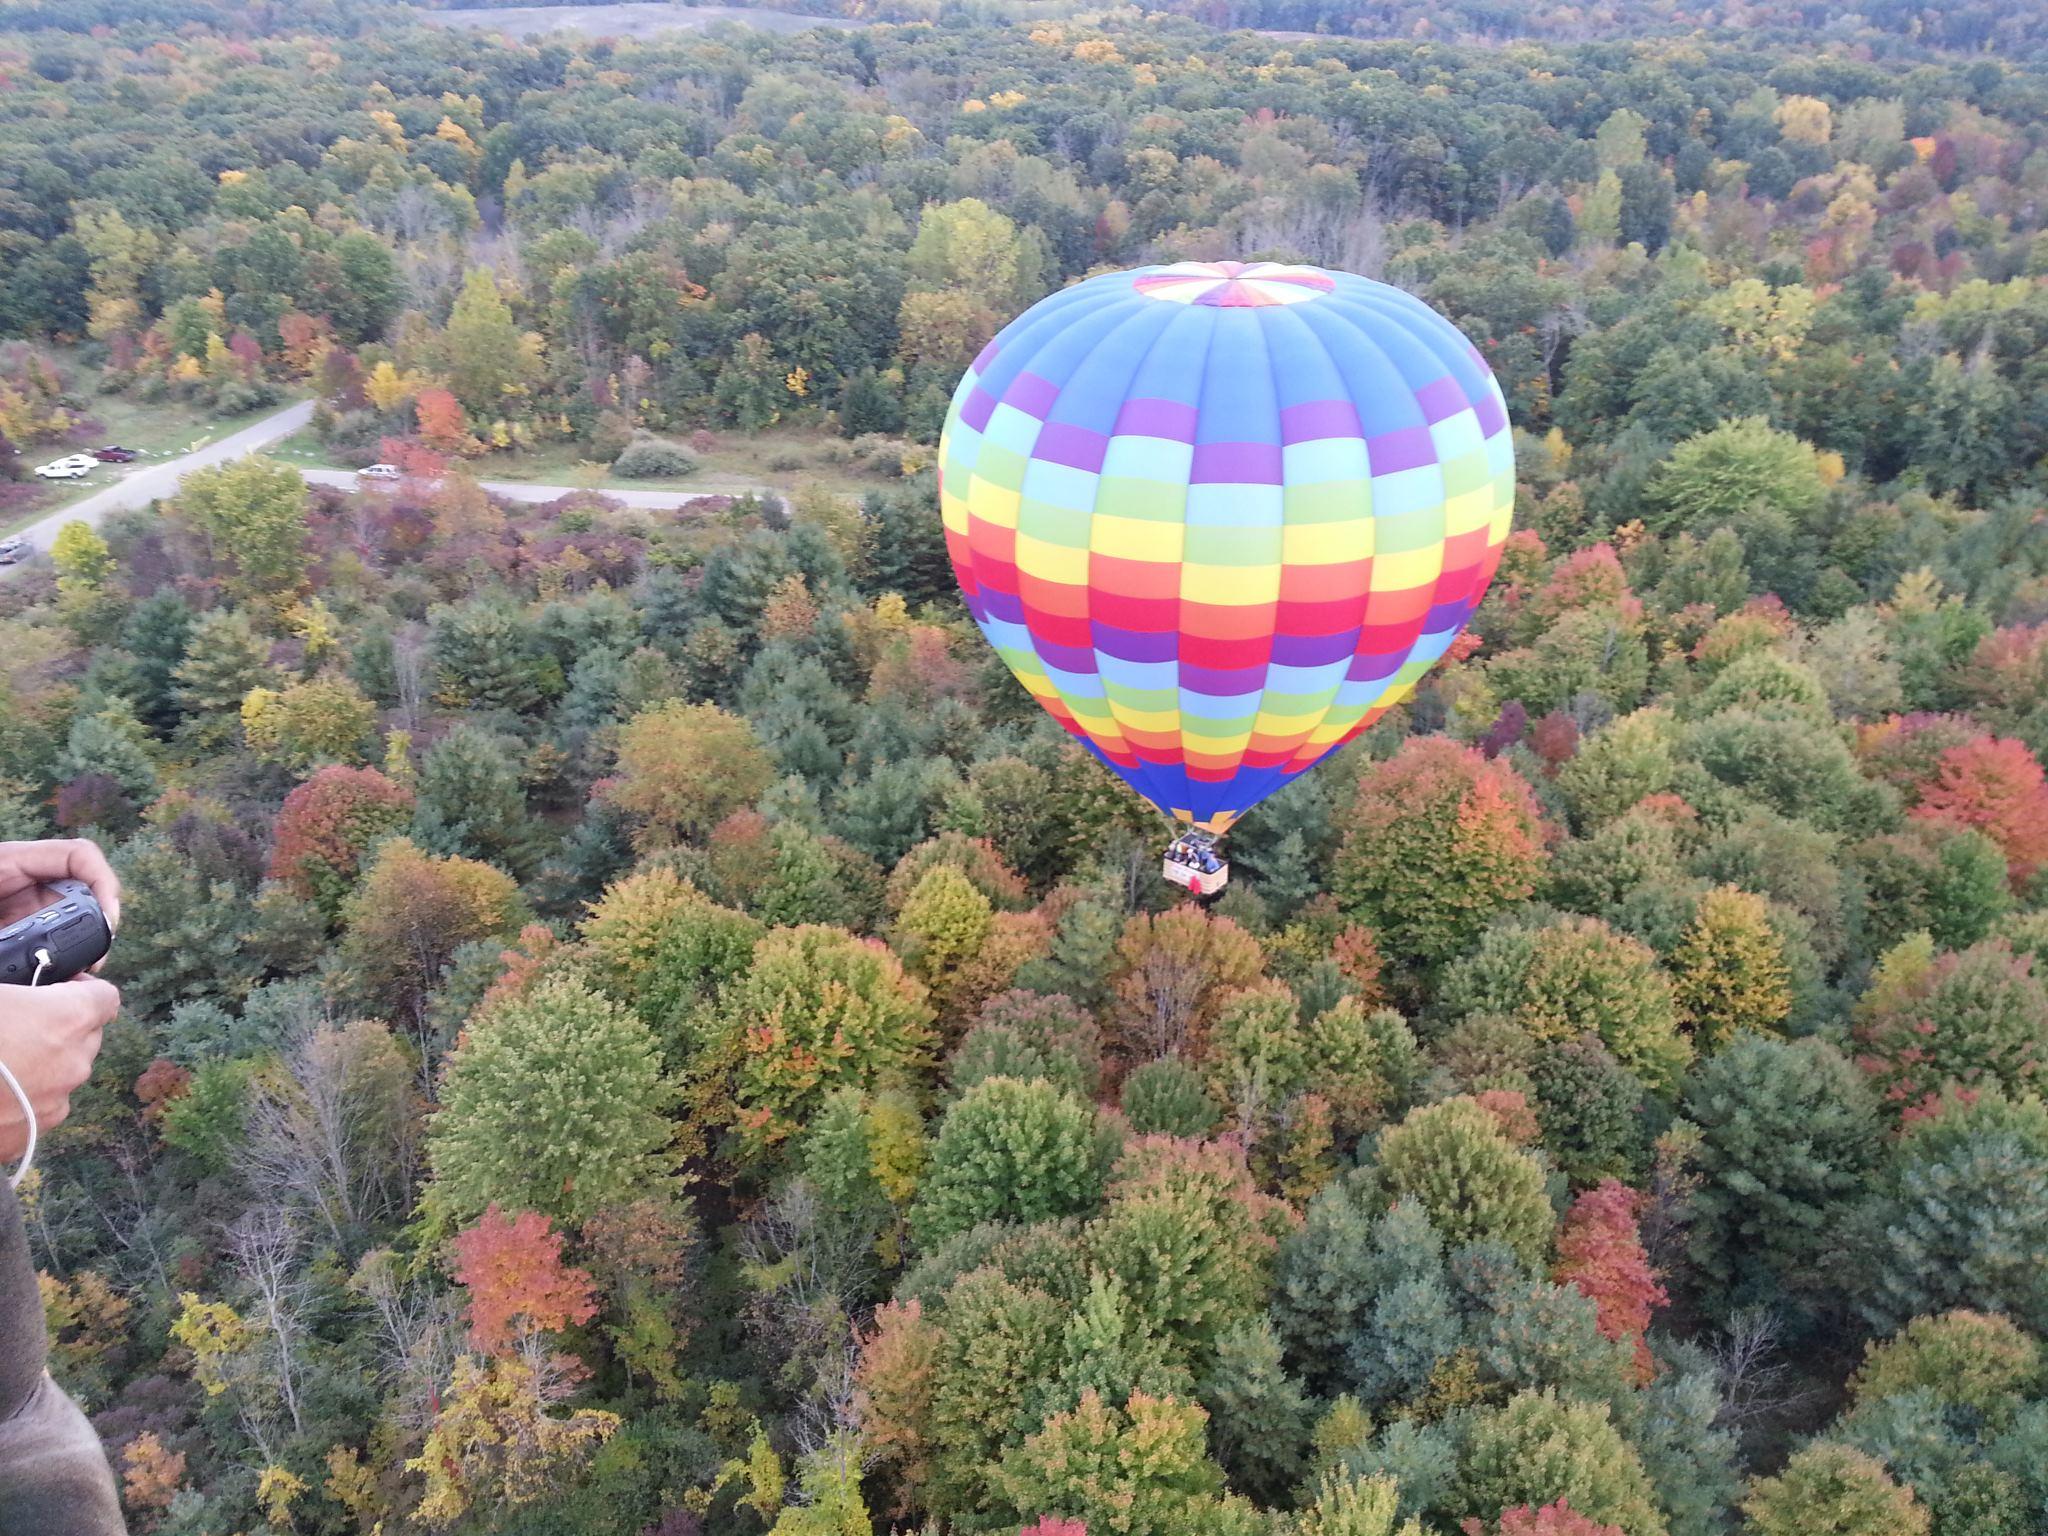 Balloon rides in Michigan